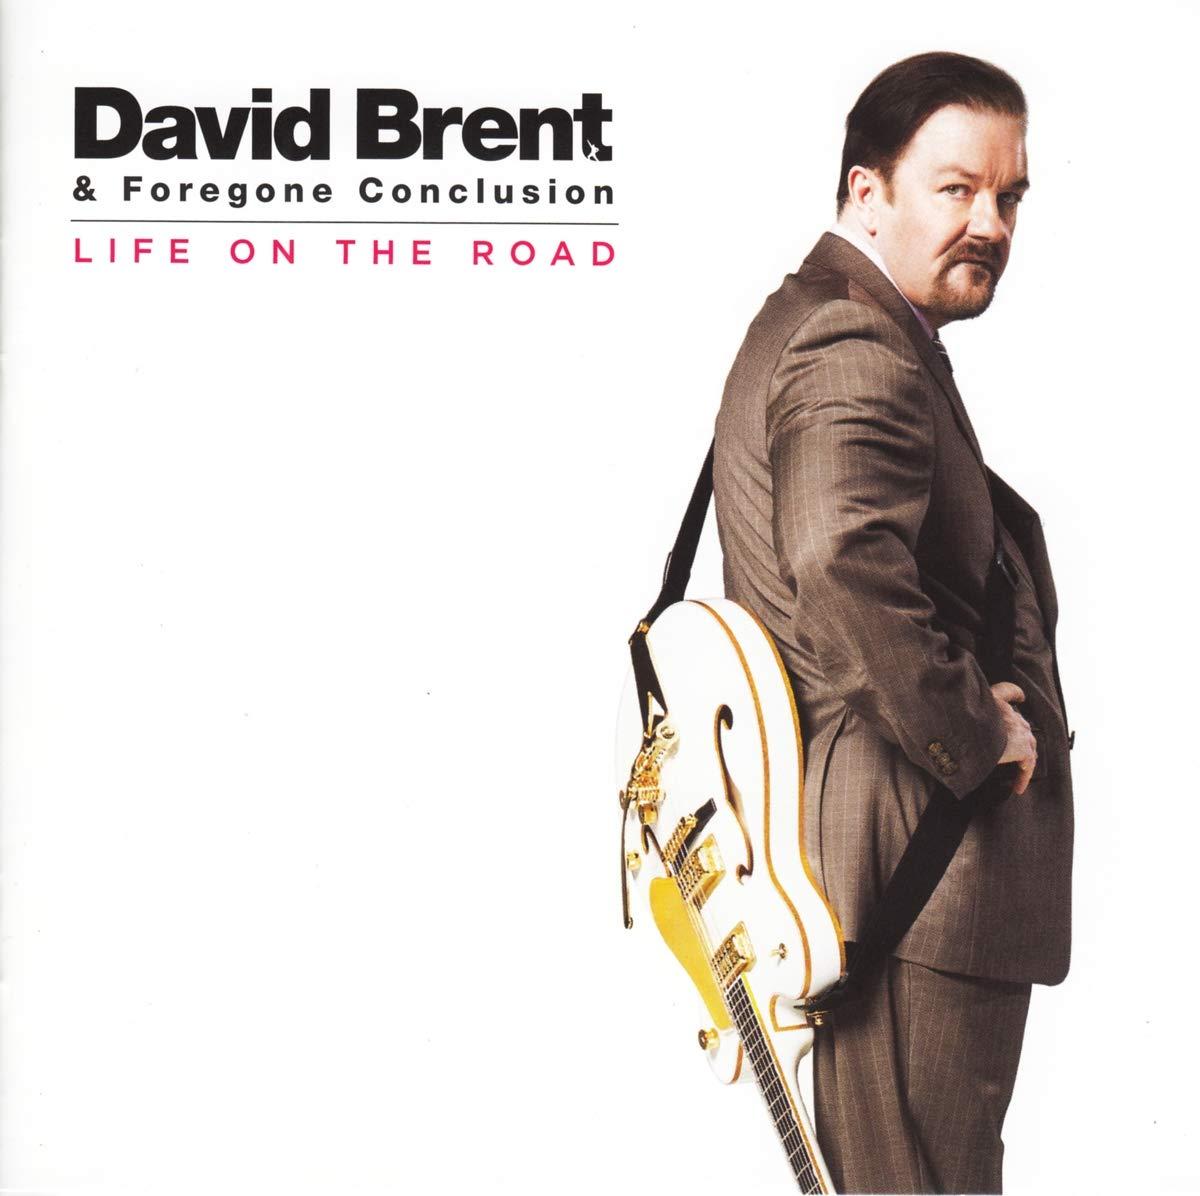 david brent life on the road free stream